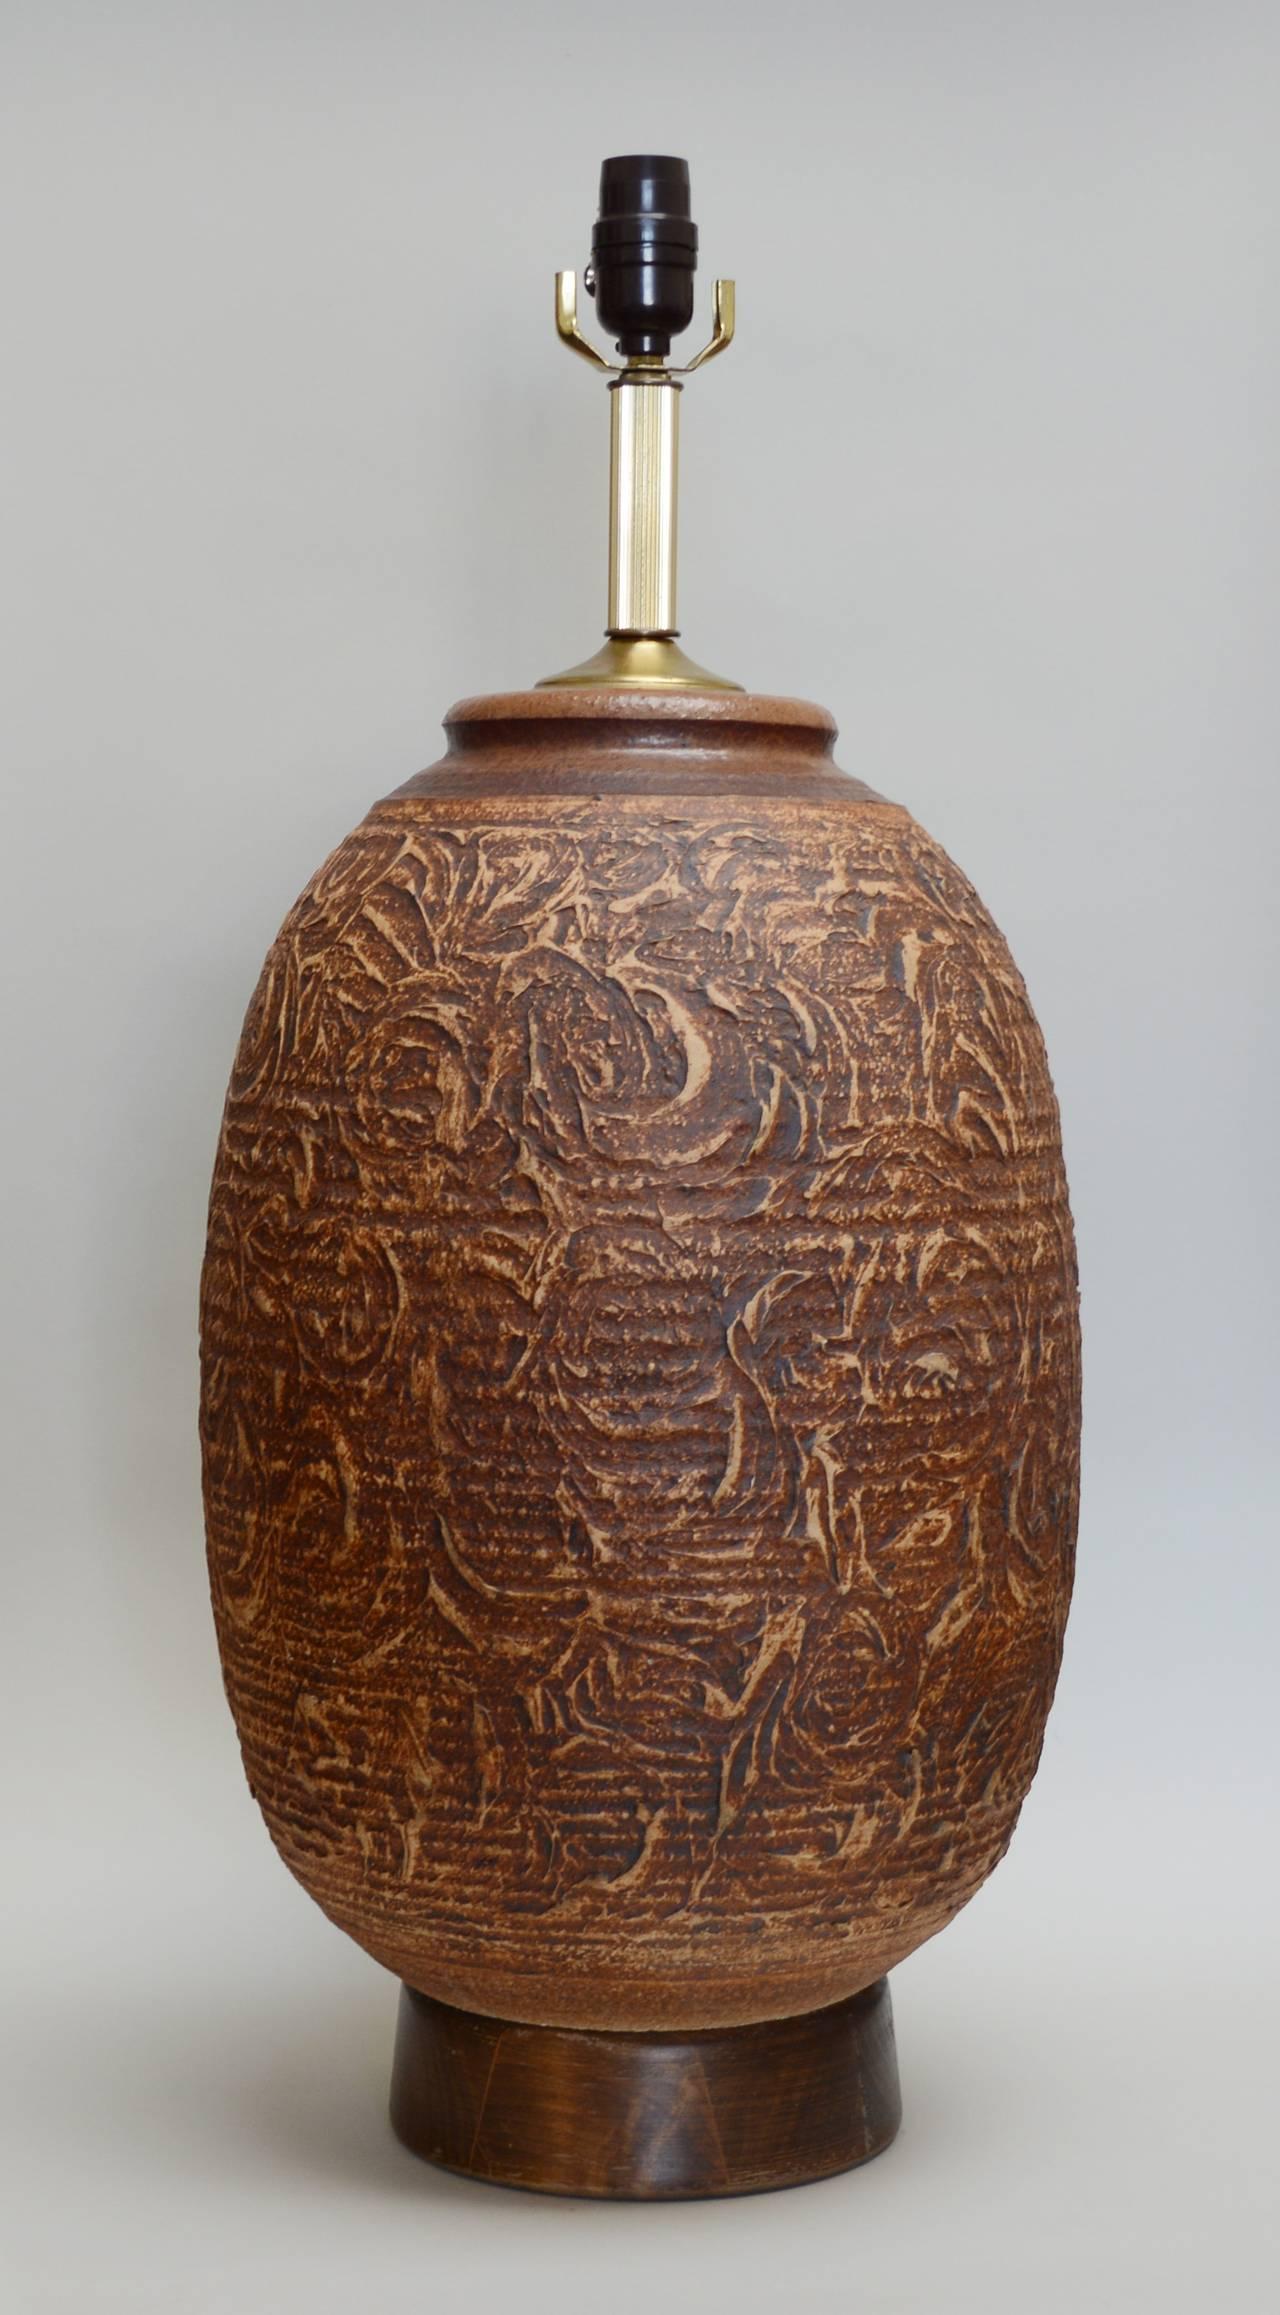 Bob Kinzie Studio Pottery Lamp At 1stdibs